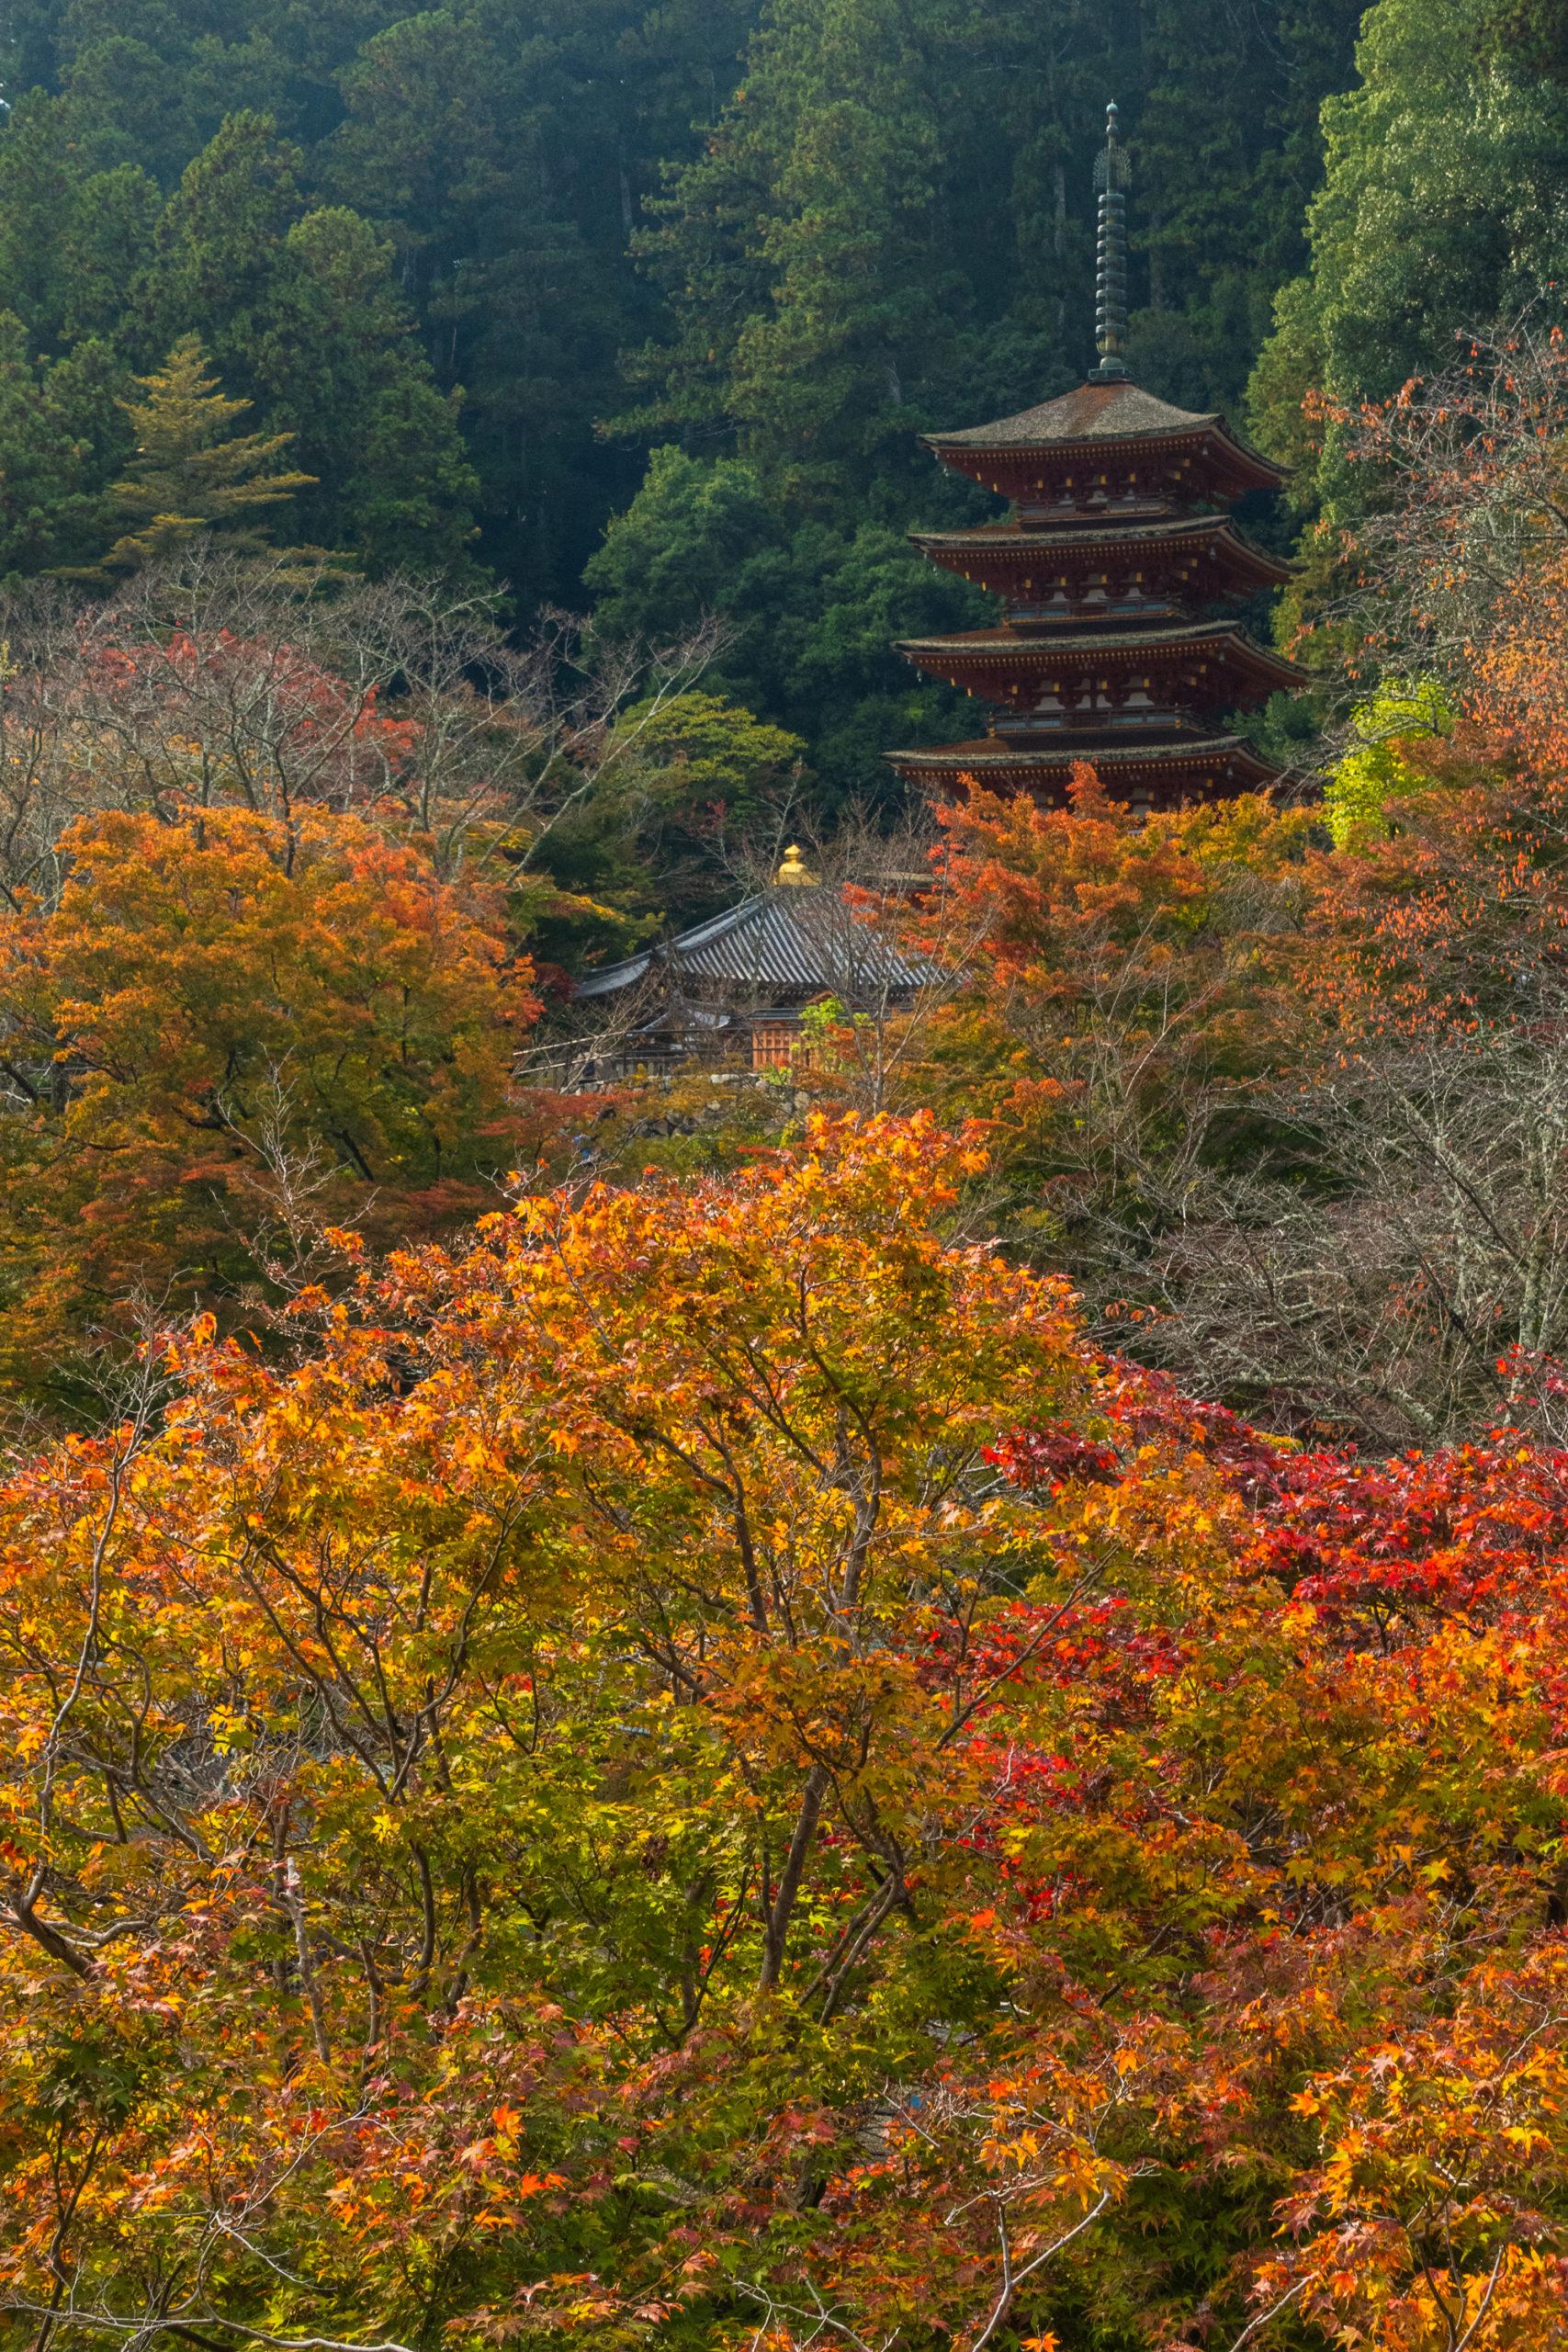 DSC00318-scaled 奈良県  長谷寺(風情を感じる五重塔と紅葉景色が美しい秋のおすすめスポット! 撮影した写真の紹介、アクセス情報や駐車場情報など)